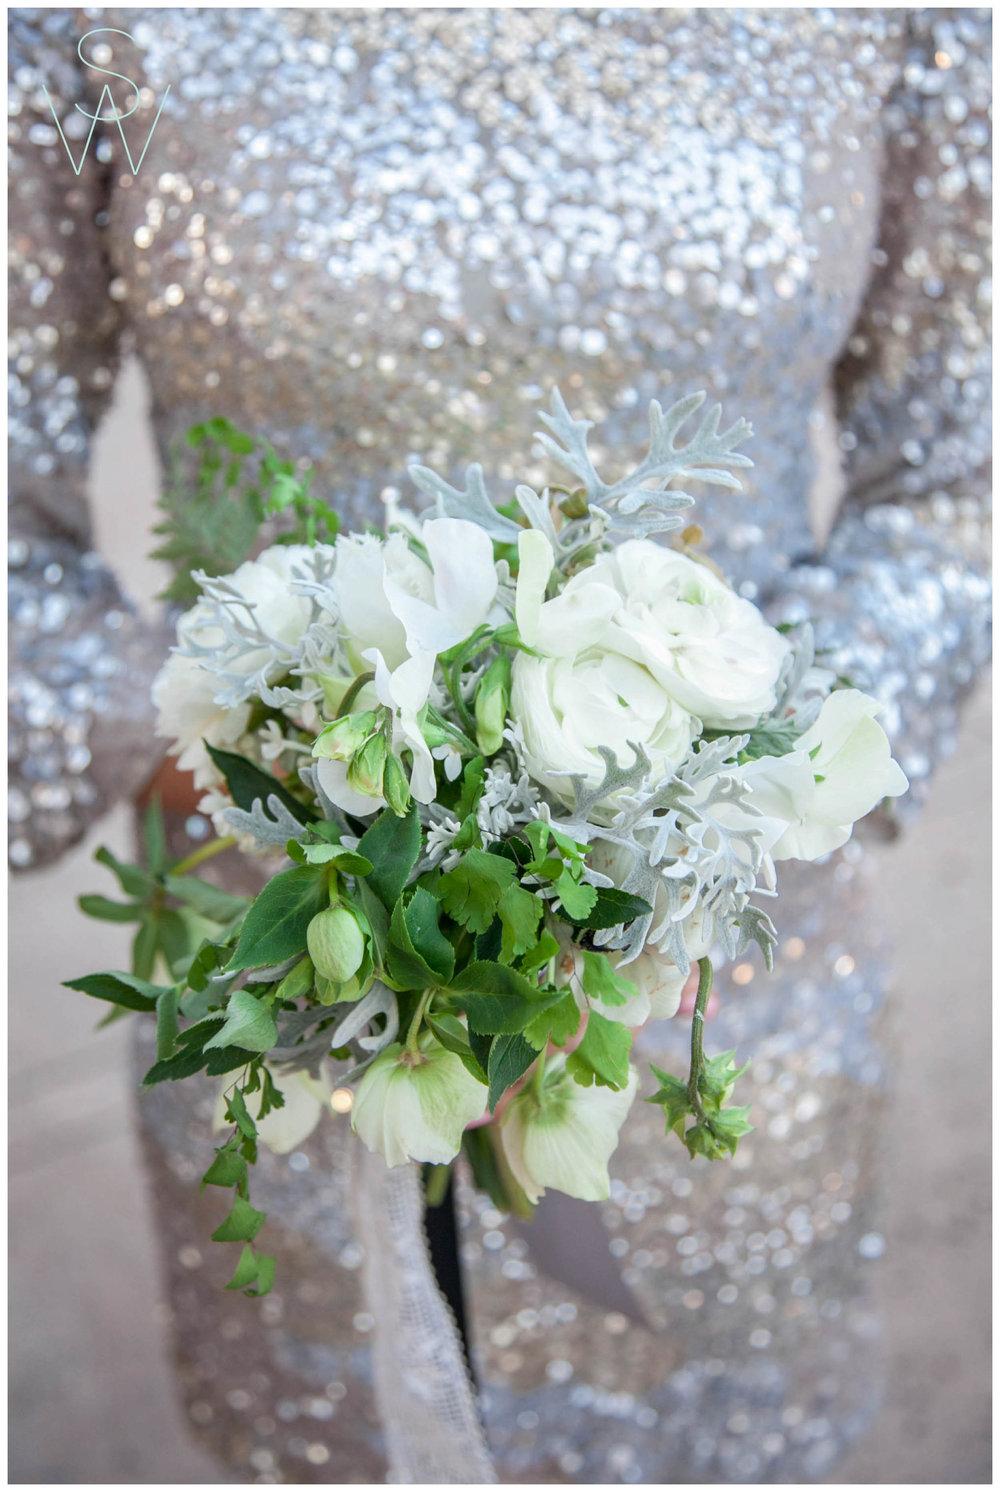 Shewanders.sdma_.wedding.photography-1035.jpg.wedding.photography-1035.jpg